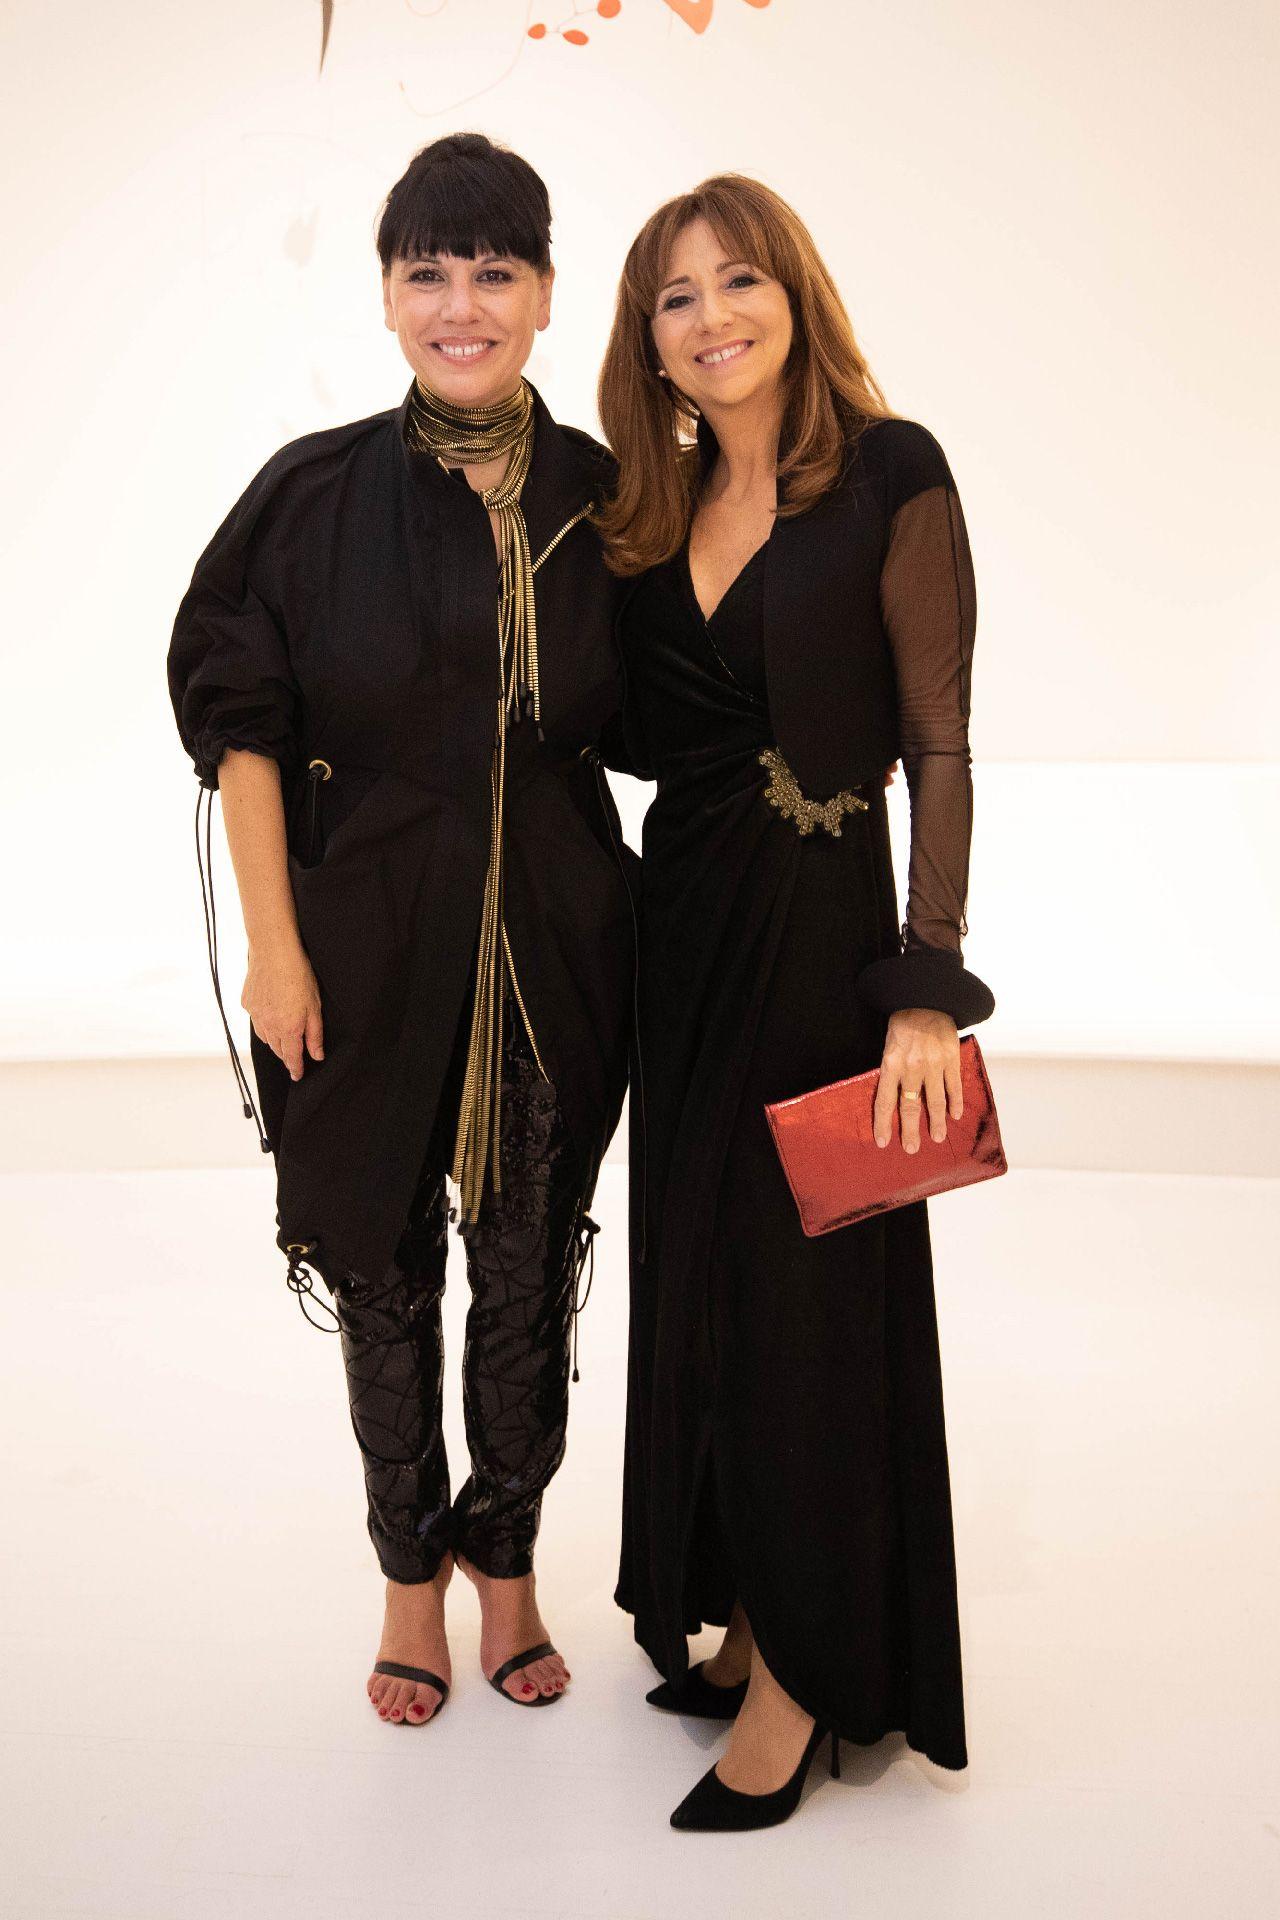 Nathalie Bondil and Nathalie Roy. Photo © Jimmy Hamelin